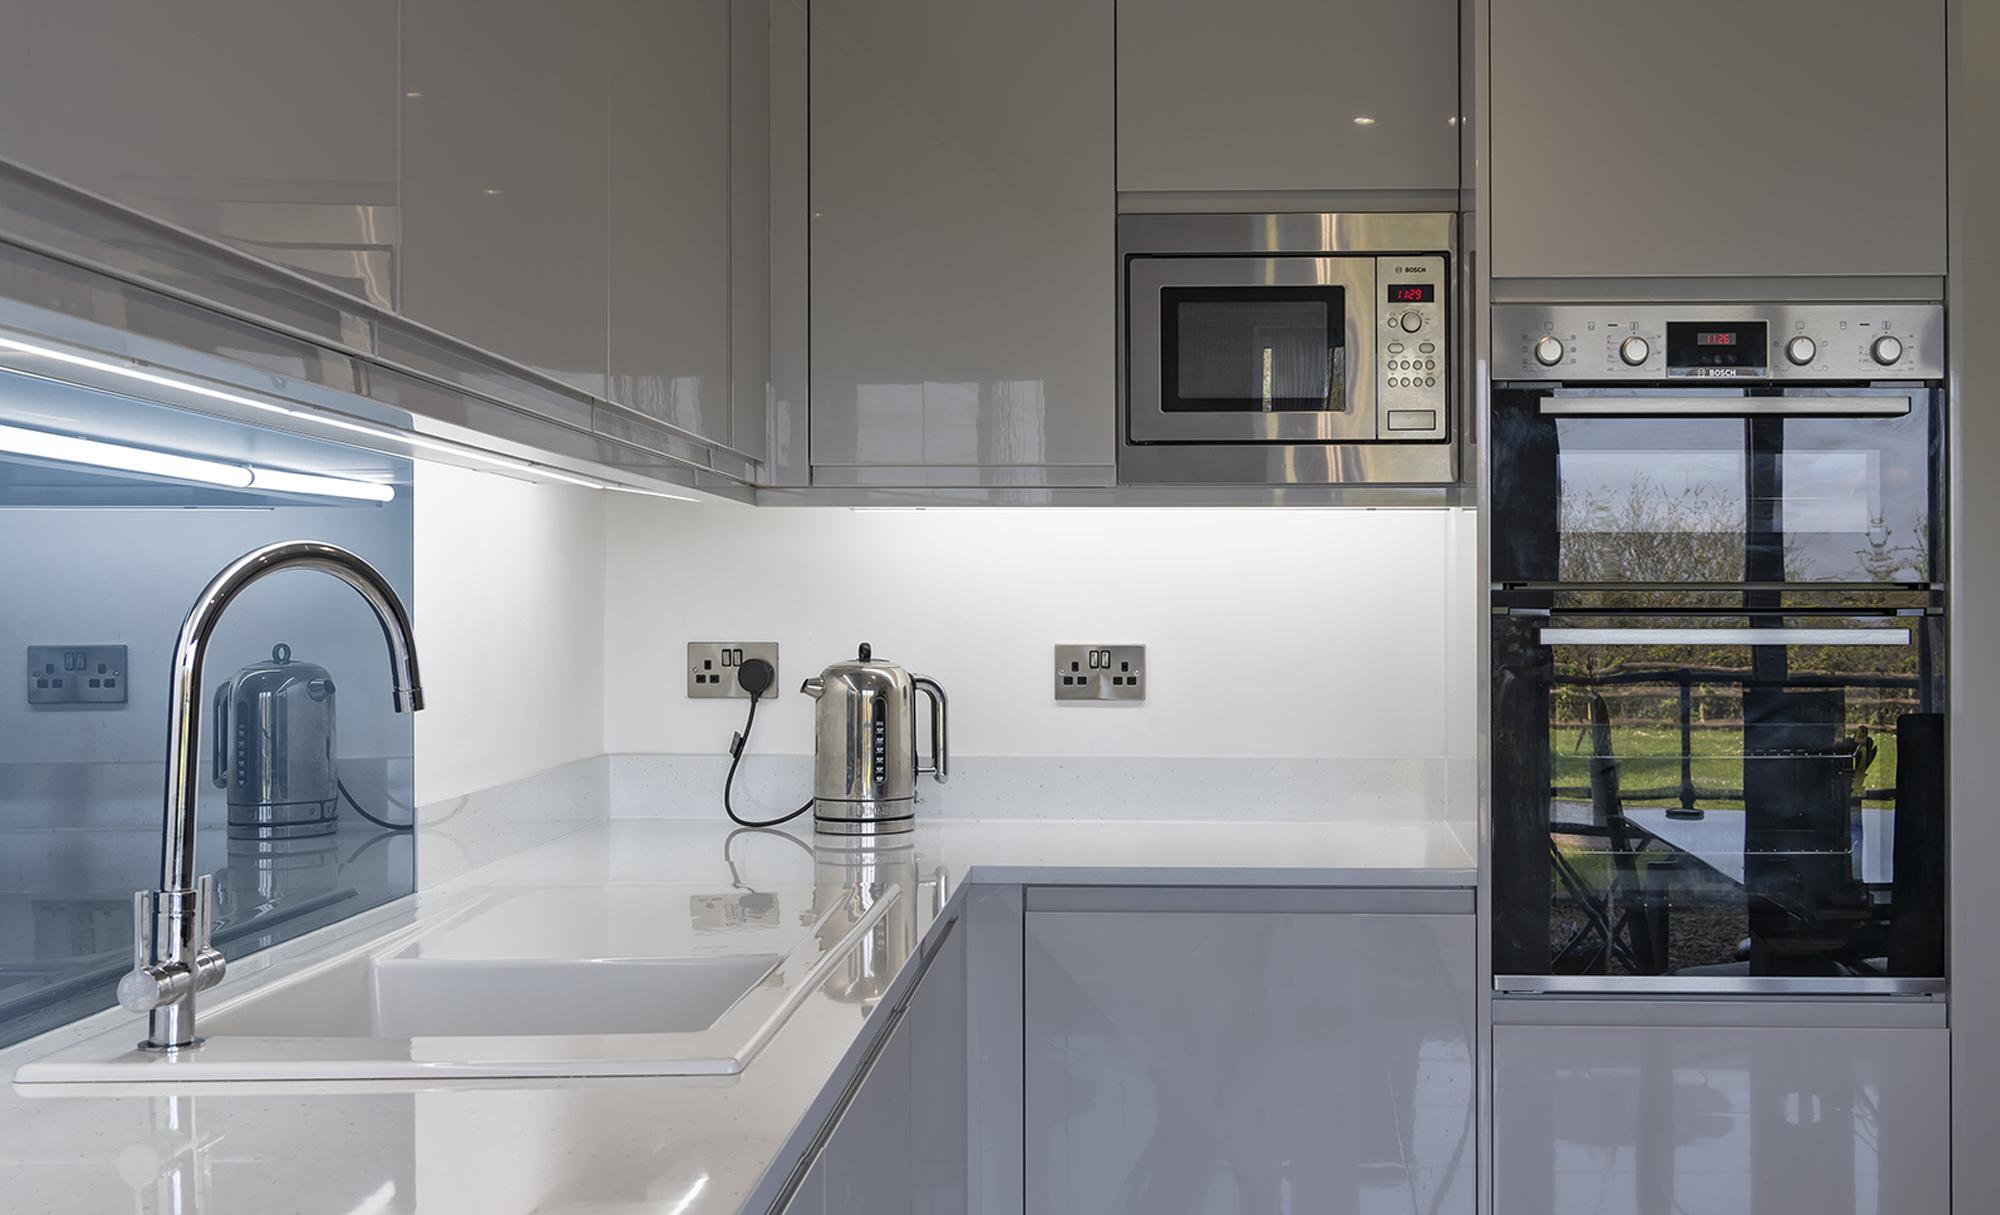 Portishead Strada Gloss Light Grey Kitchen for Mr & Mrs Whitaker in Village Quarter, Portishead